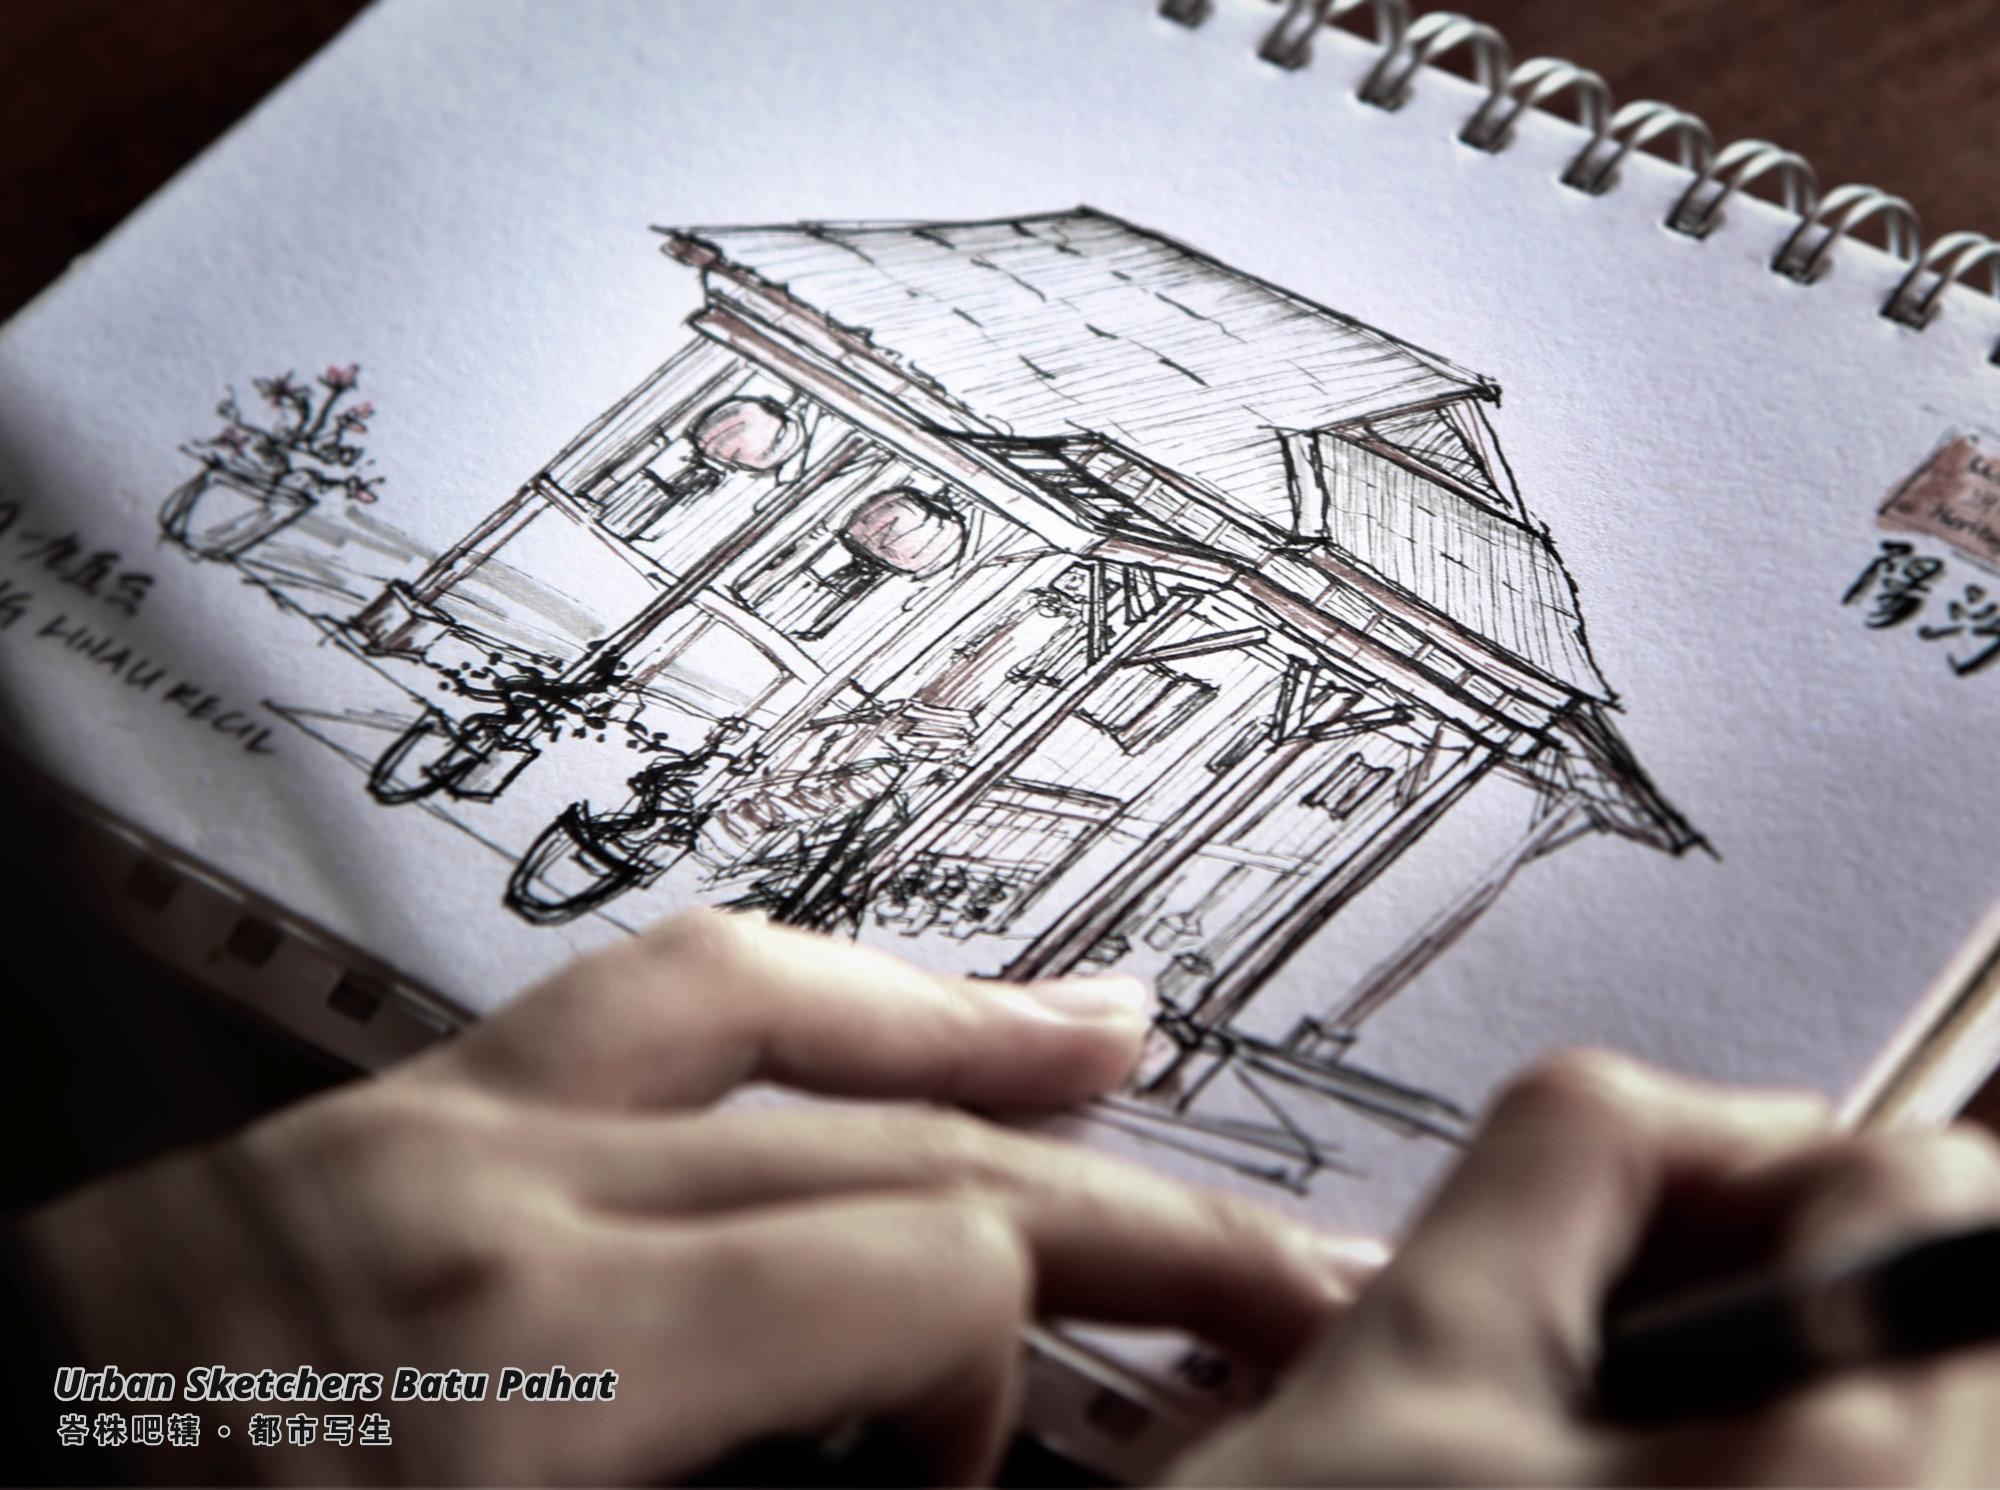 Urban Sketchers Batu Pahat Johor Malaysia Art Drawing Sketching 马来西亚 柔佛 峇株吧辖都市写生 艺术 画画 A023